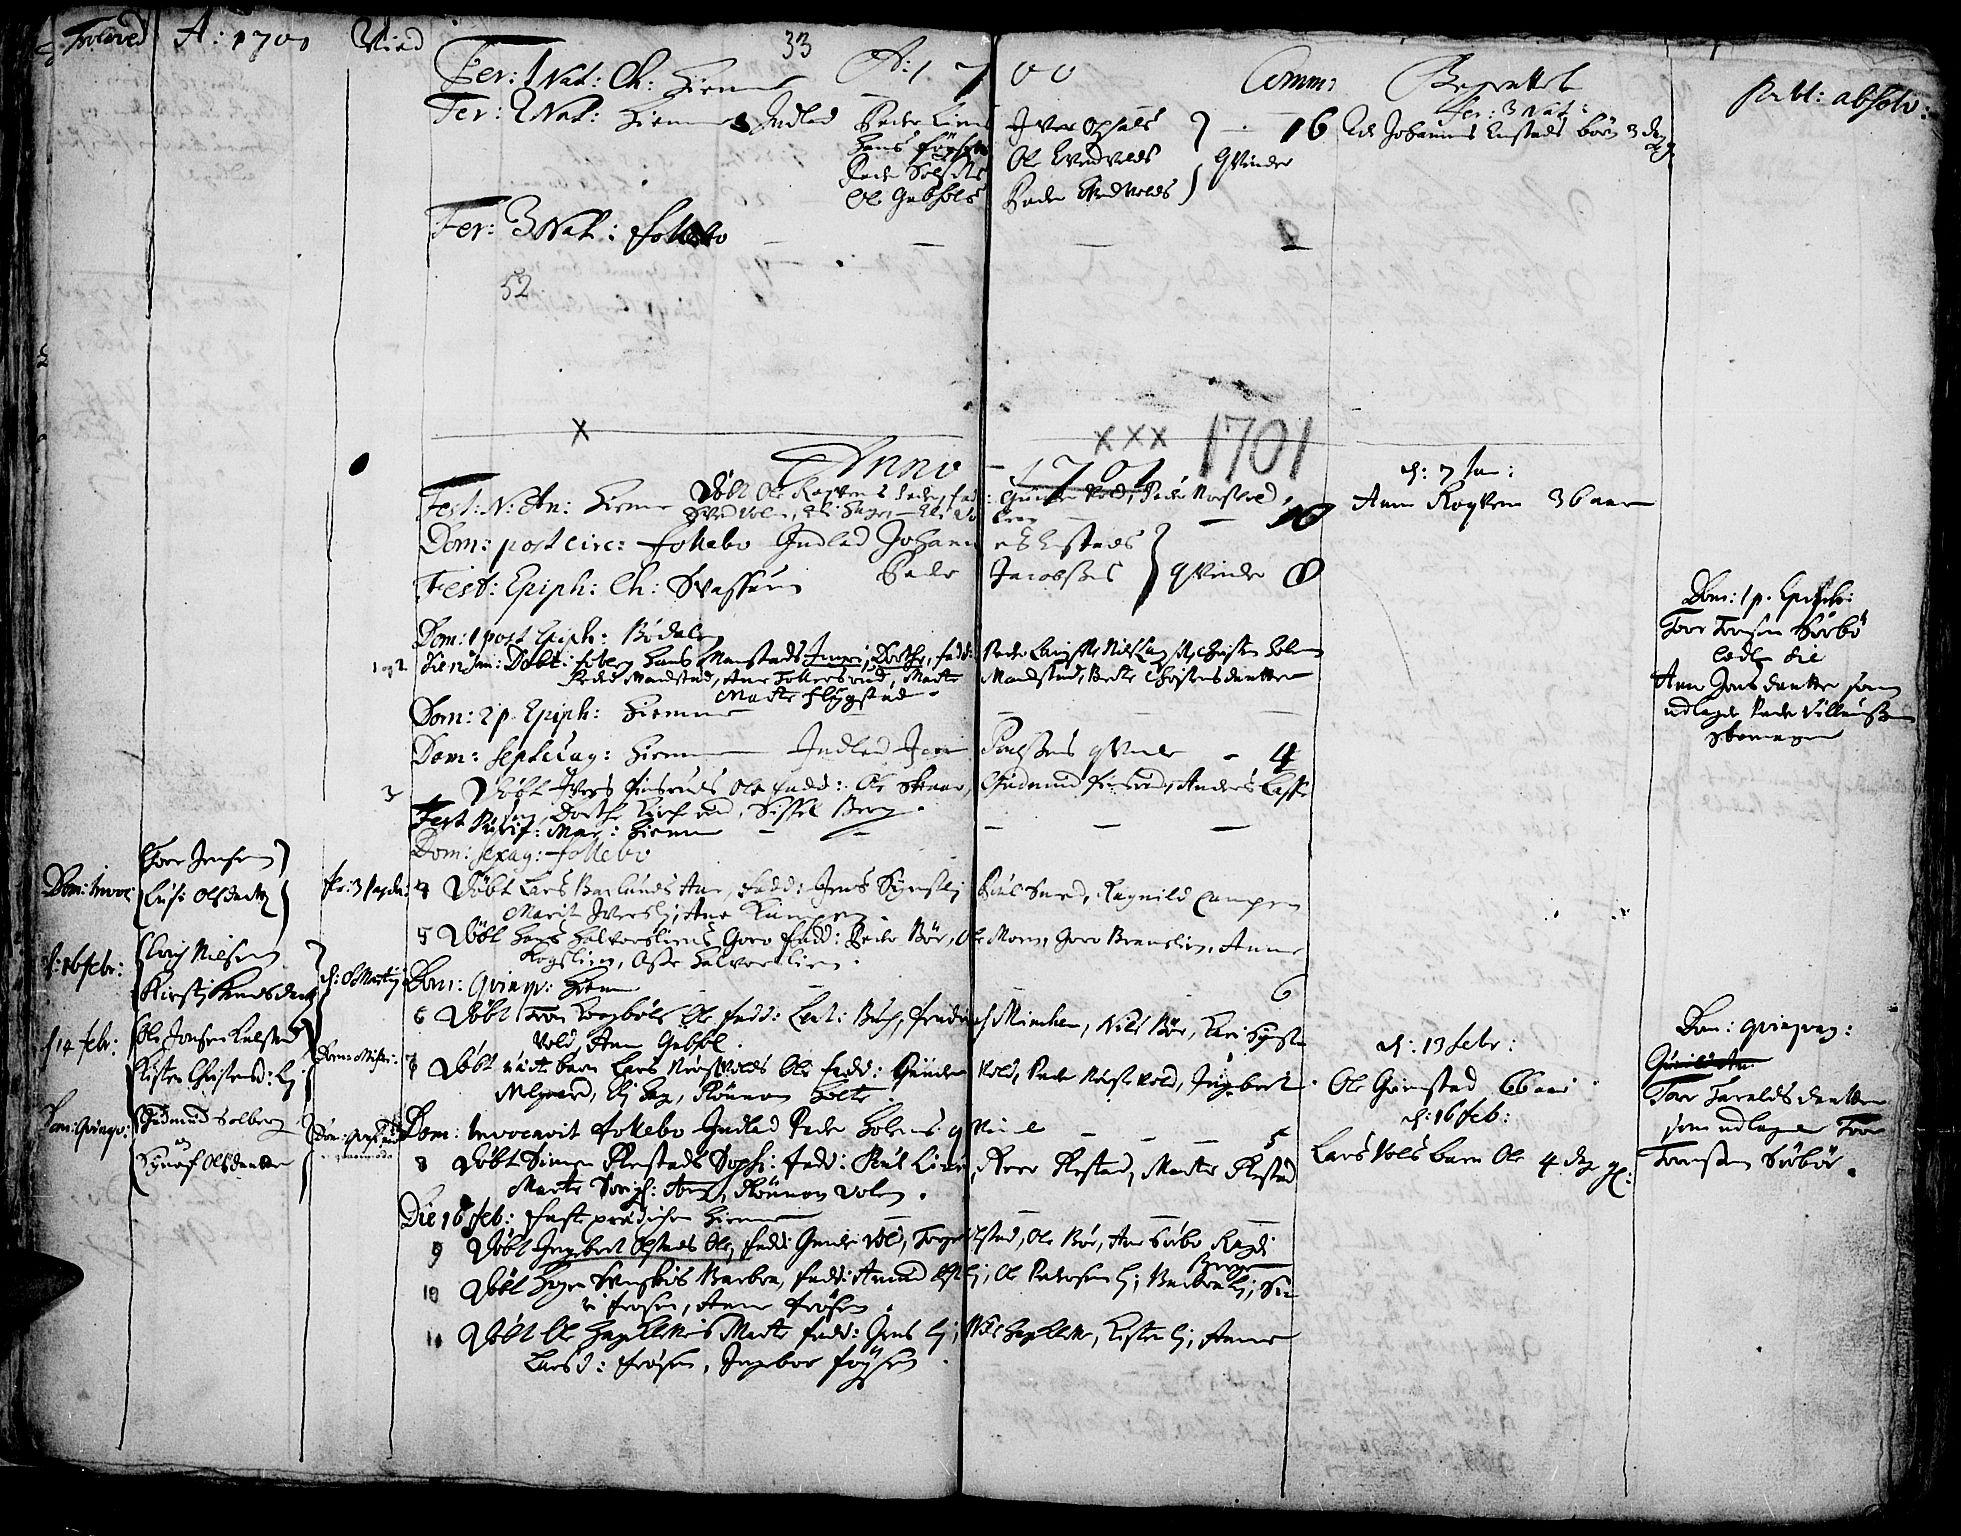 SAH, Gausdal prestekontor, Ministerialbok nr. 1, 1693-1728, s. 33